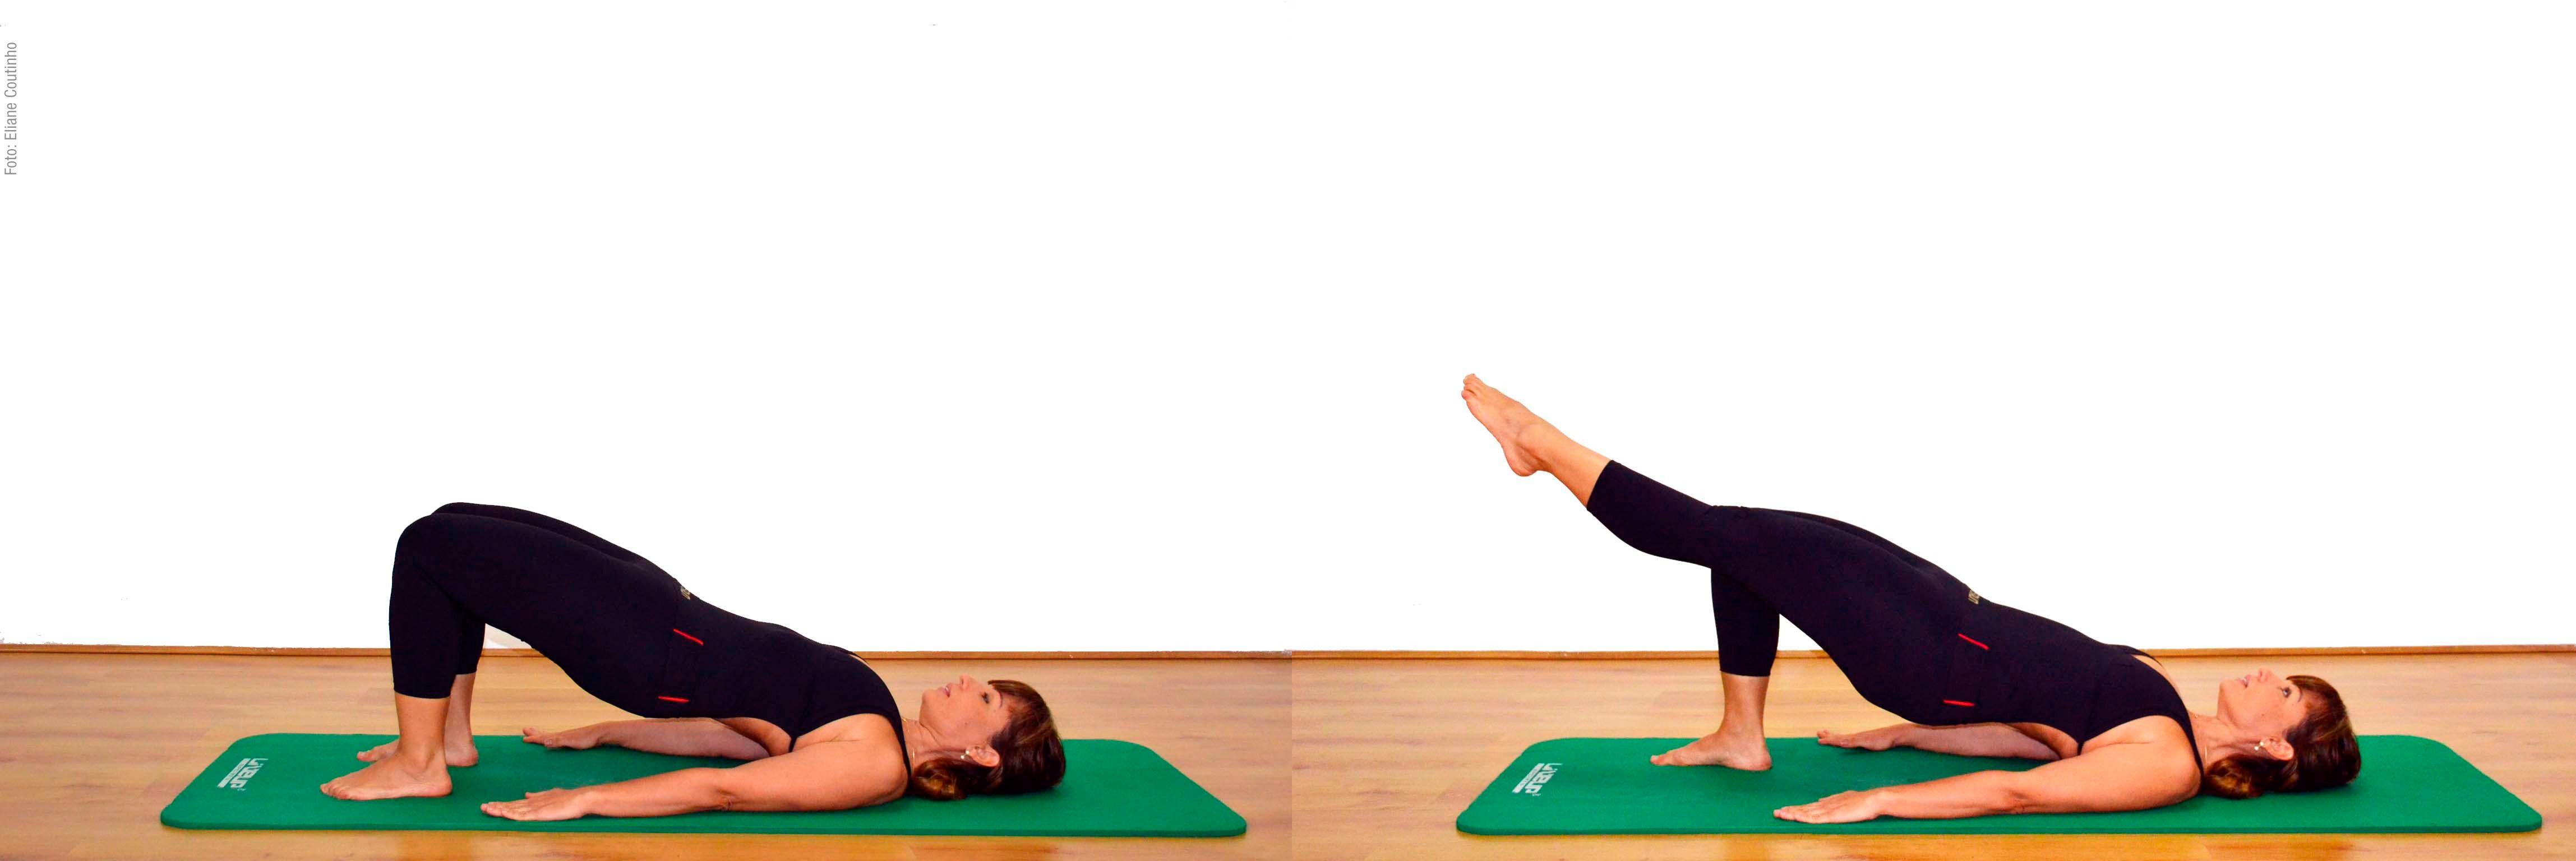 Combata A Hernia De Disco Com 10 Exercicios Atividades Fisicas